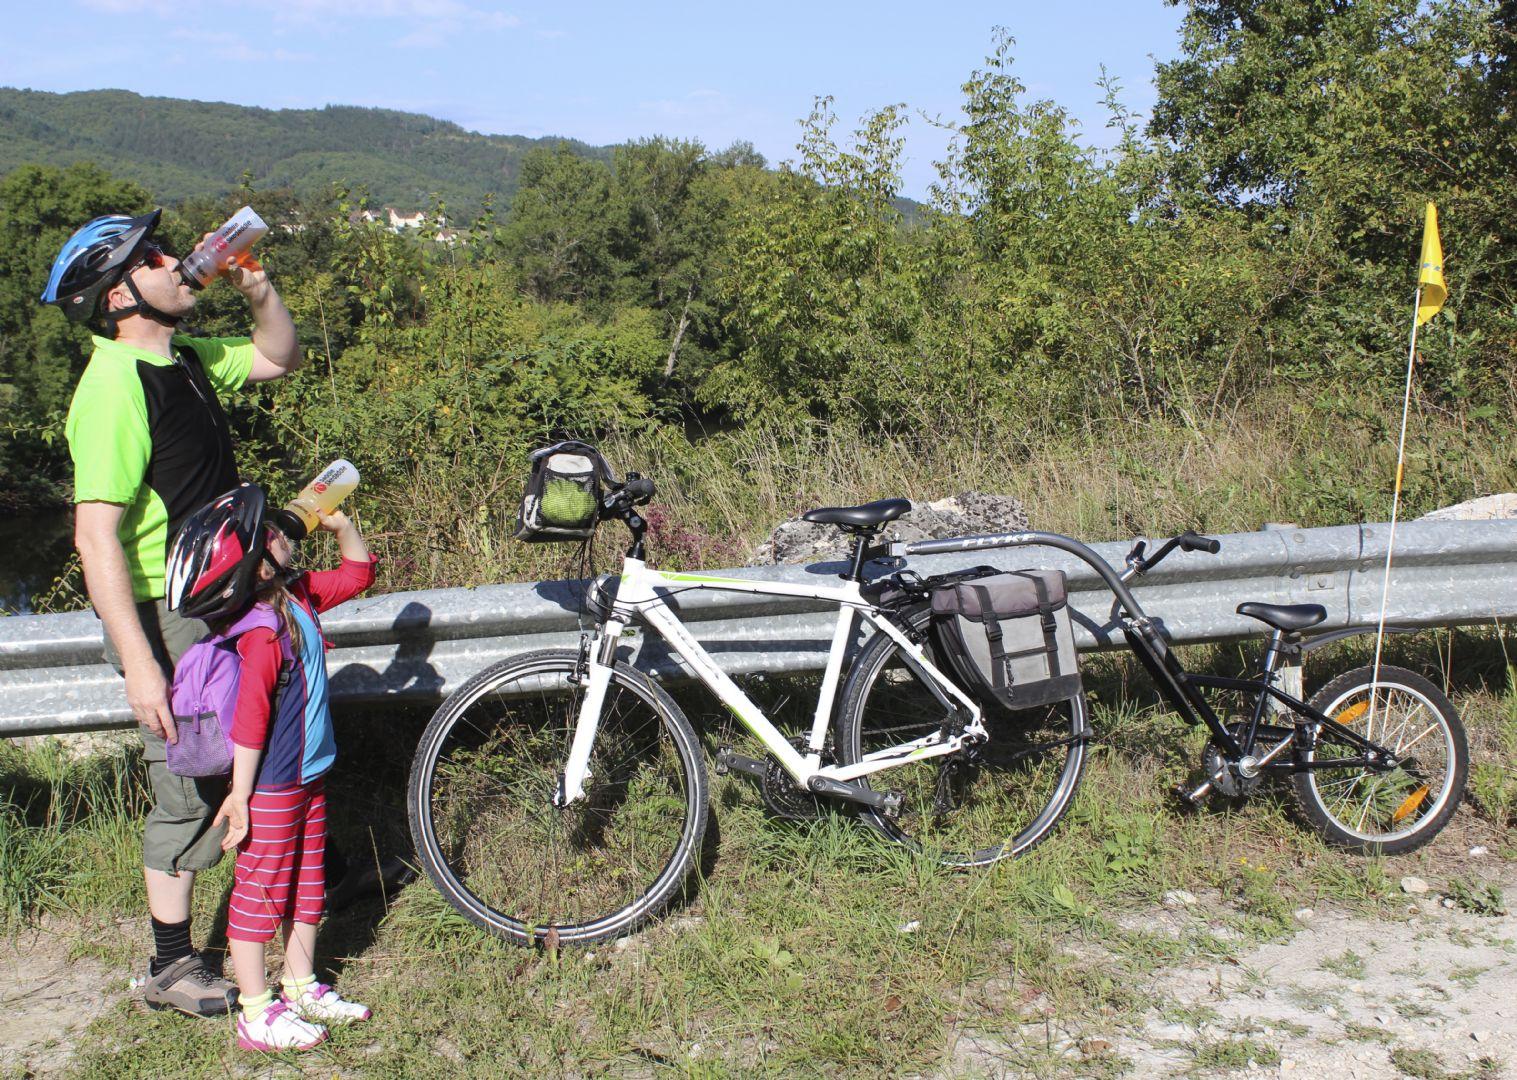 francefamilycycling3.jpg - France - Burgundy - Puisaye Paradise - Self-Guided Family Cycling Holiday - Family Cycling